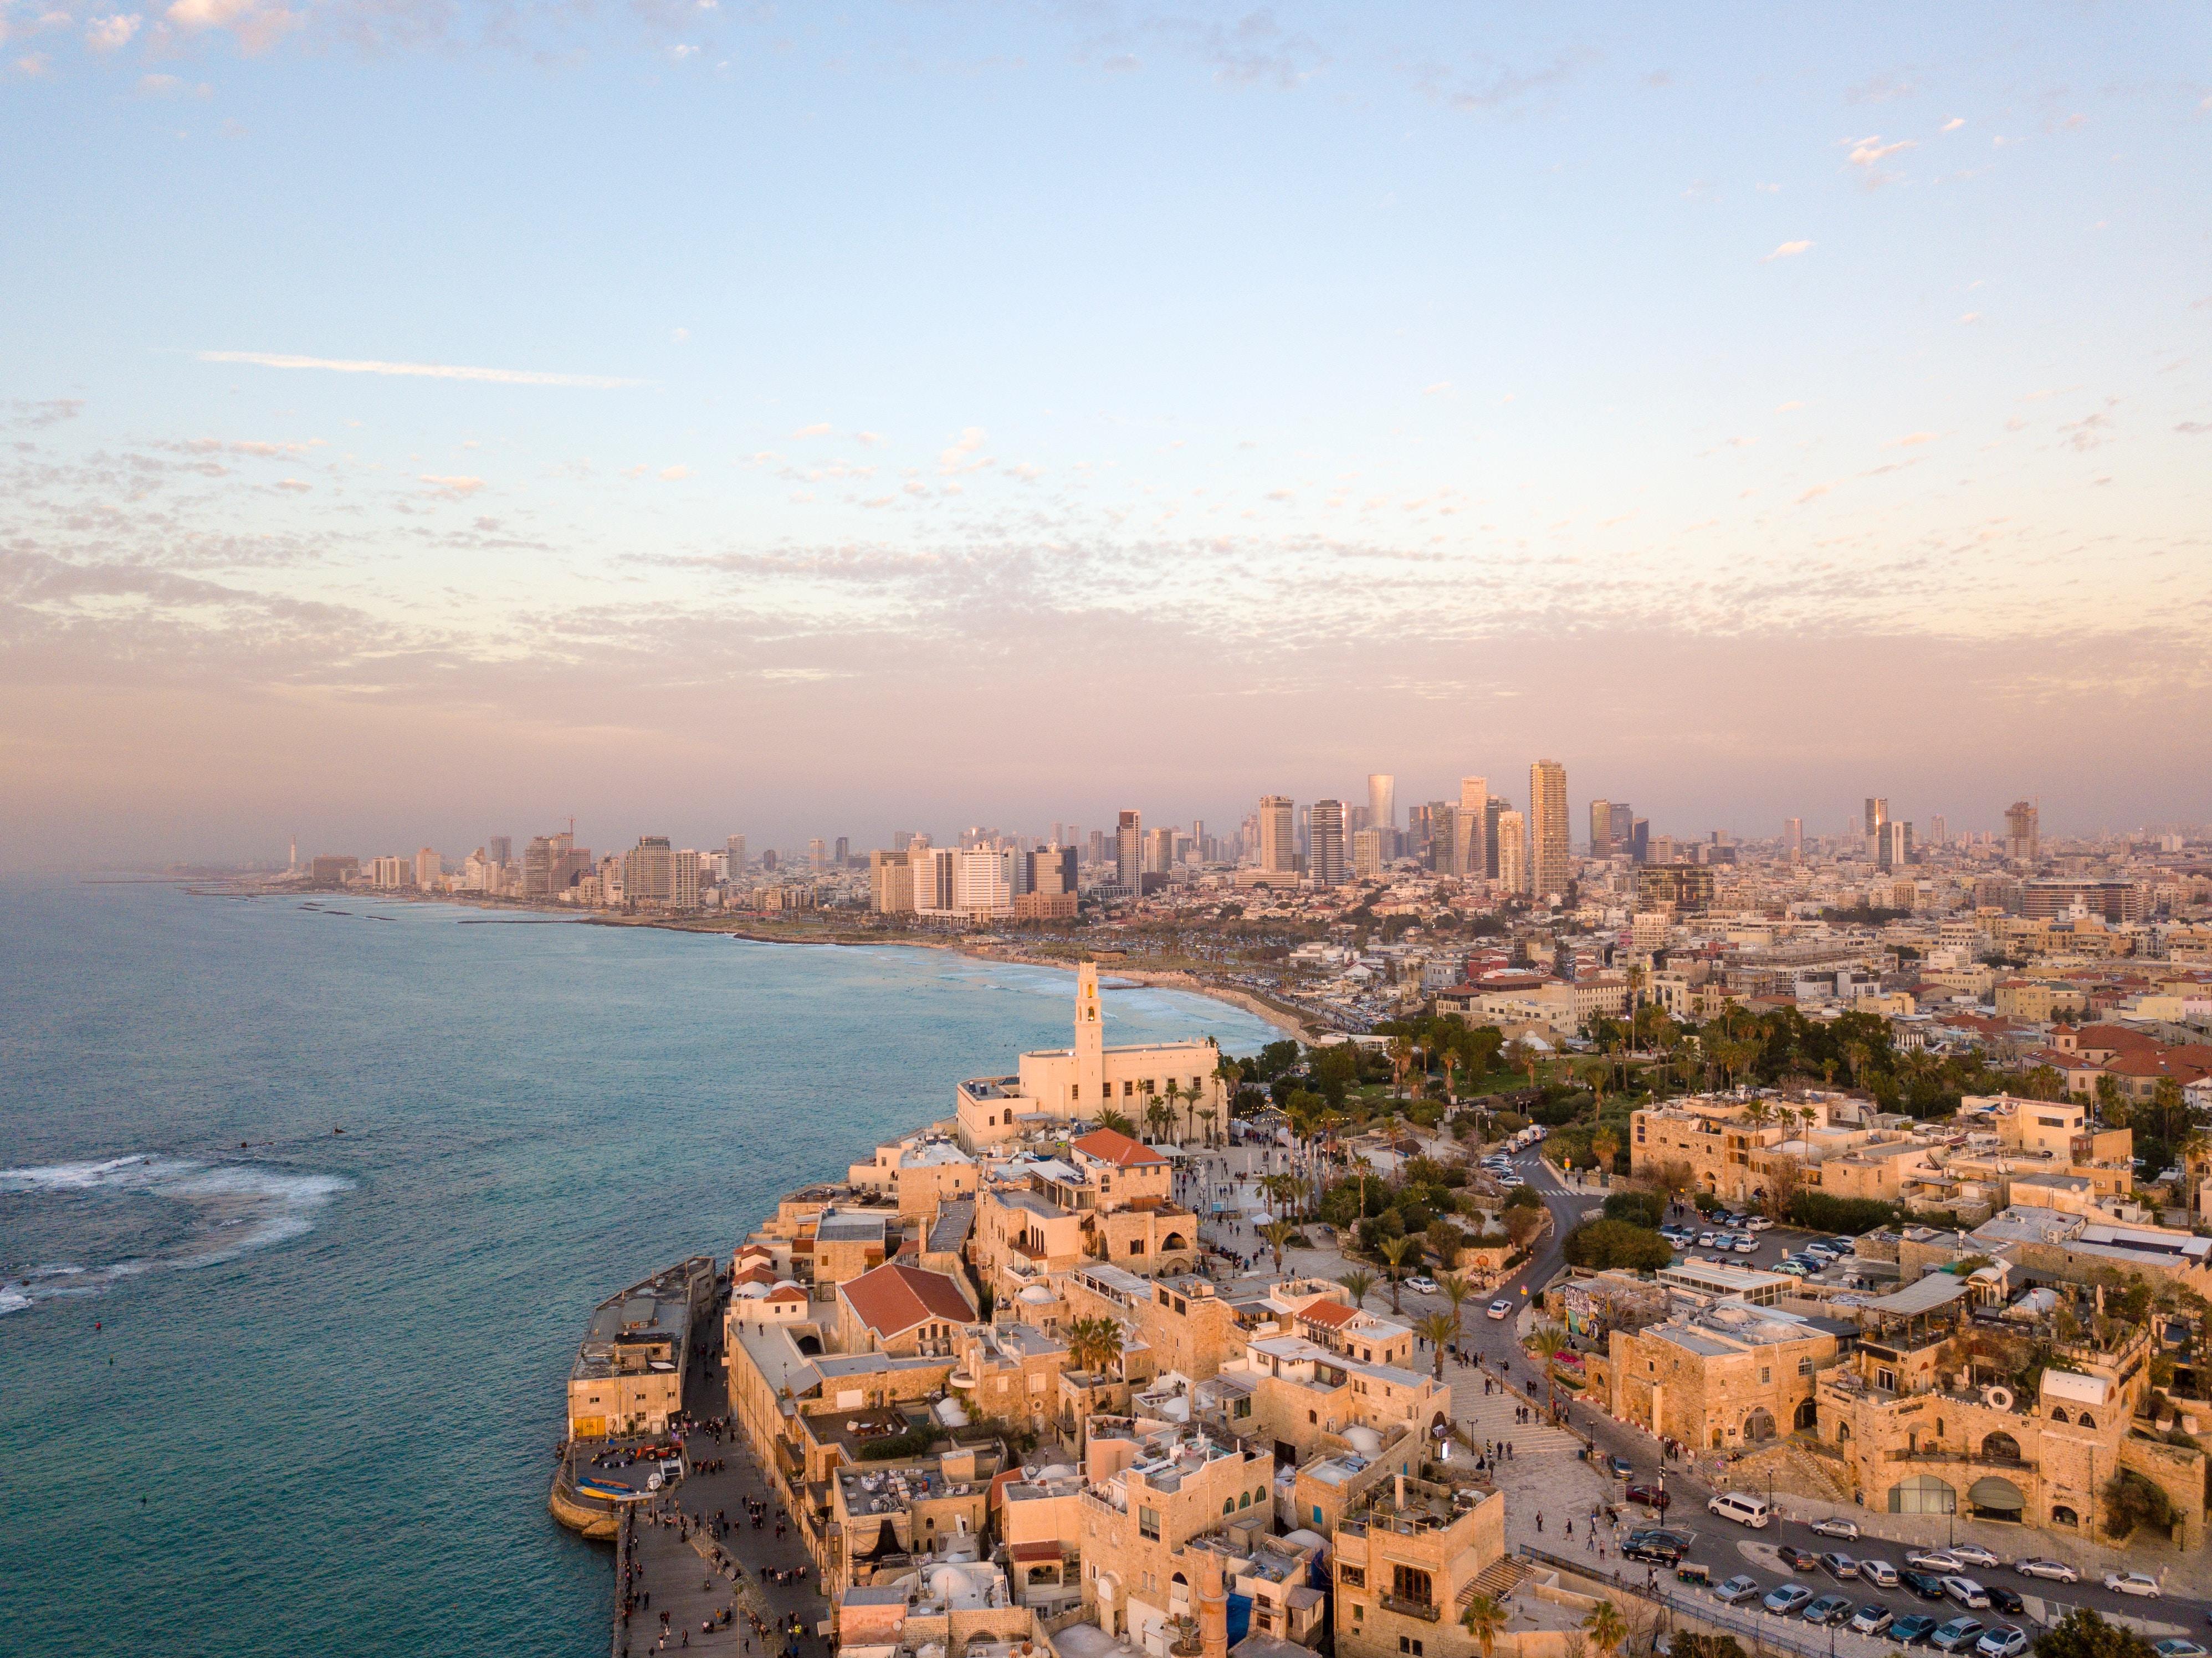 Jaffa and Tel Aviv